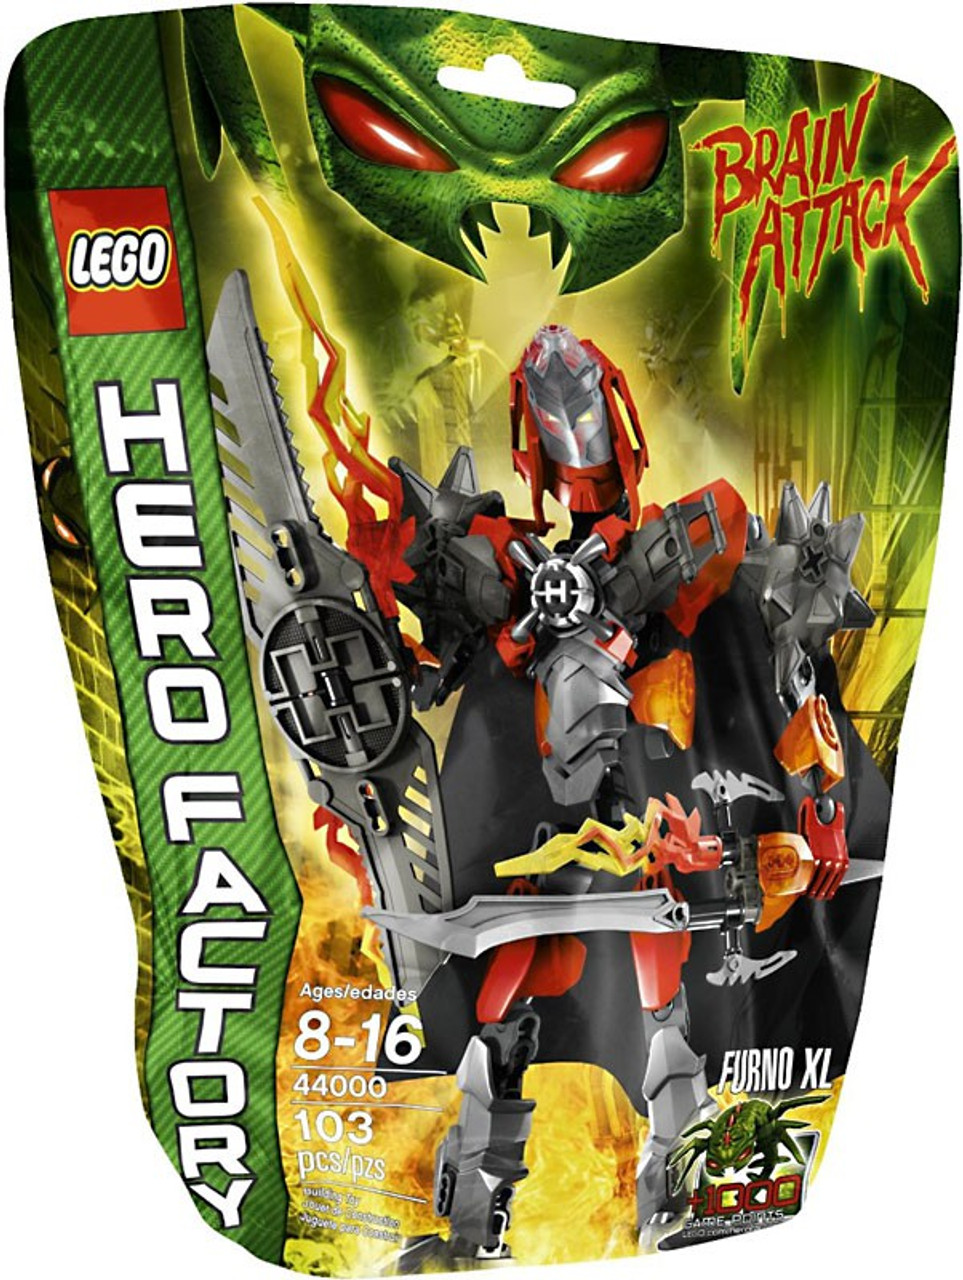 LEGO Hero Factory Furno XL Set #44000